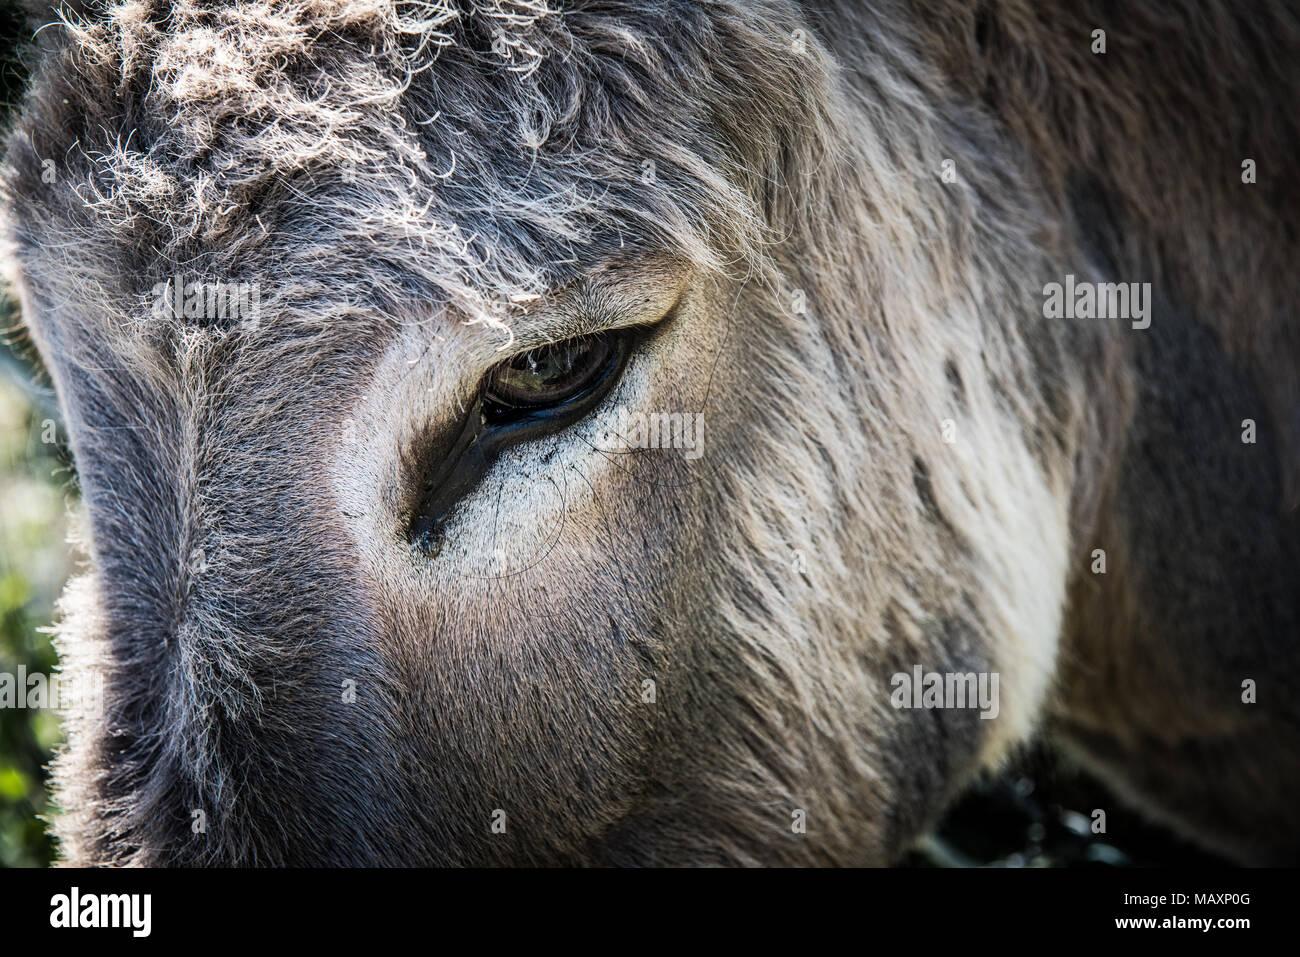 Close up portrait of a donkey's eye Photo Stock